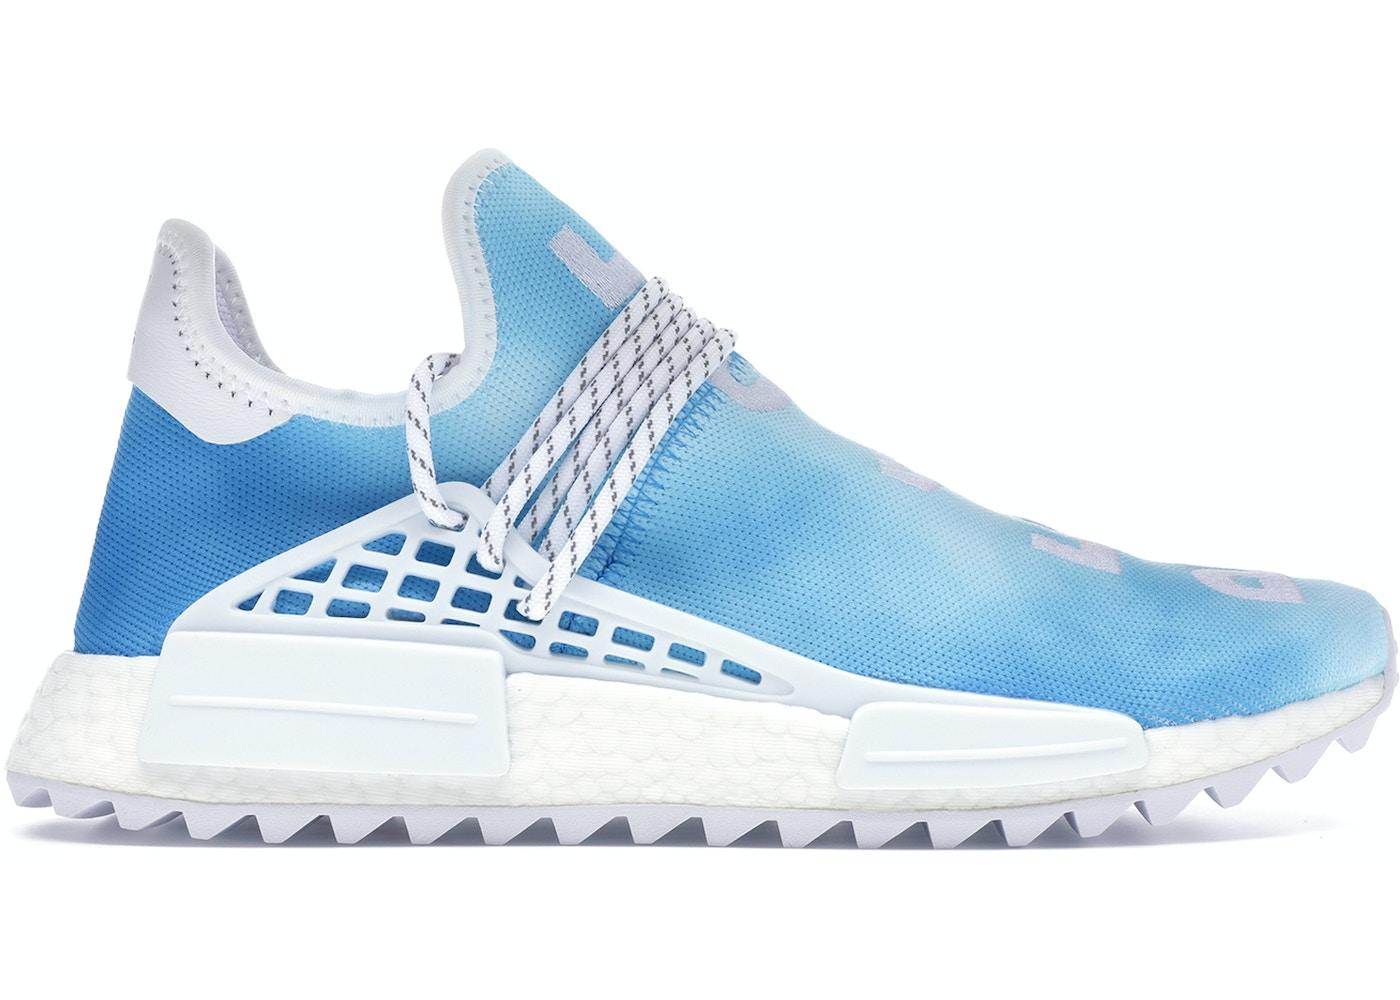 edeb47ee8 adidas Pharrell NMD HU China Pack Peace (Blue) - F99763